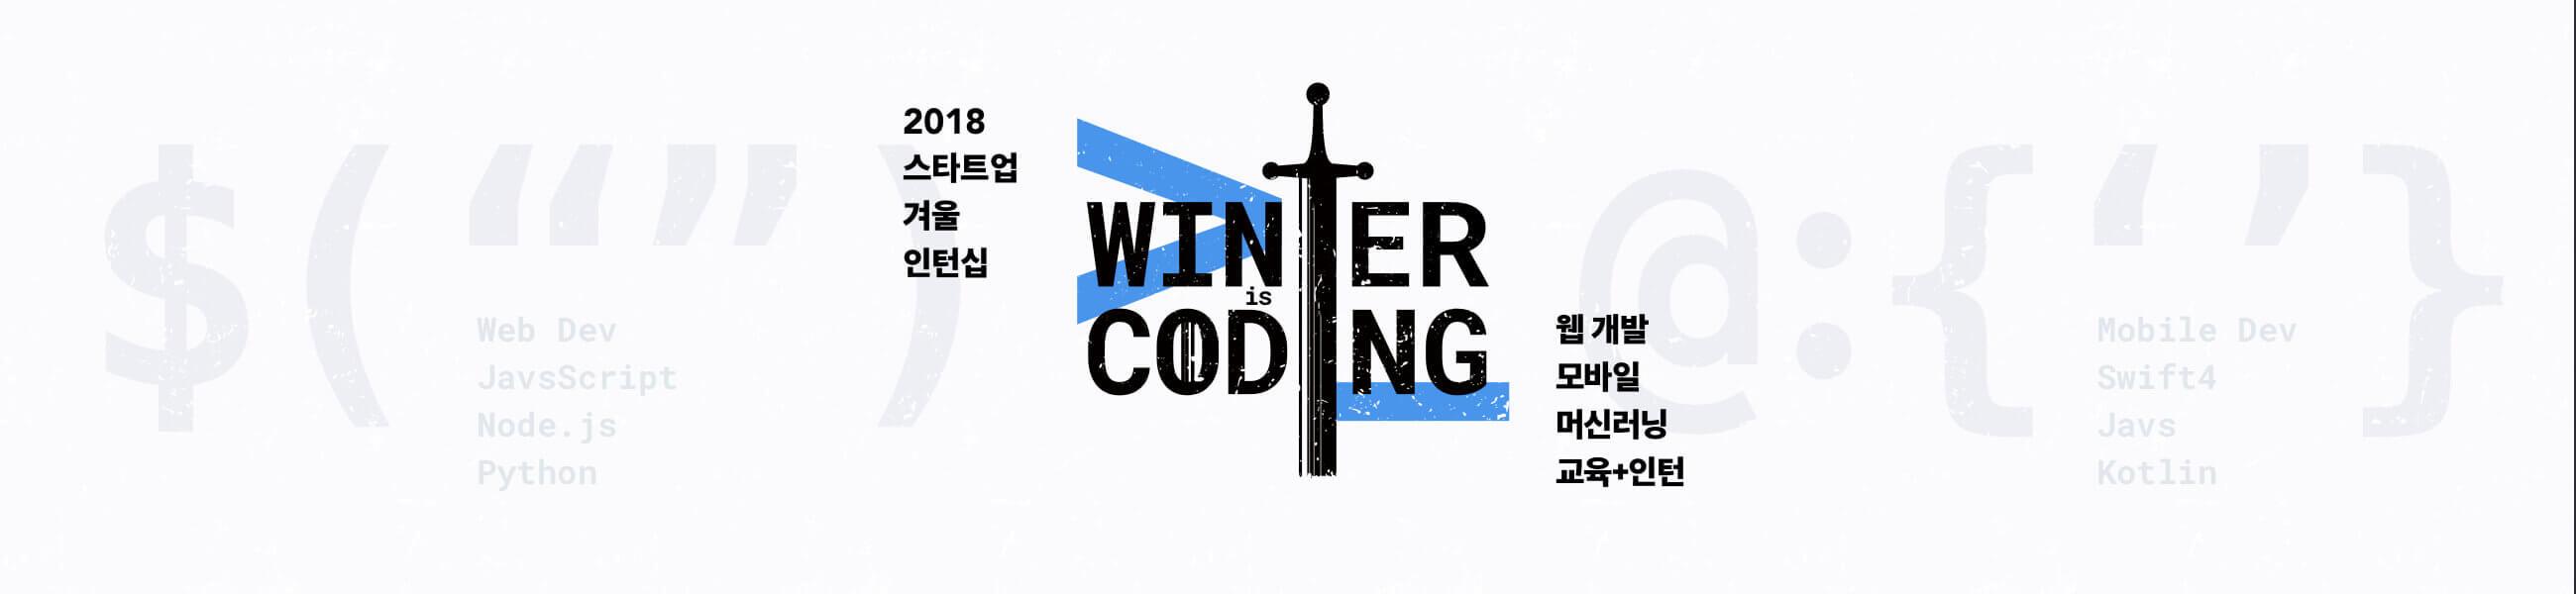 2018 Winter Coding - 겨울 스타트업 인턴 프로그램 의 이미지